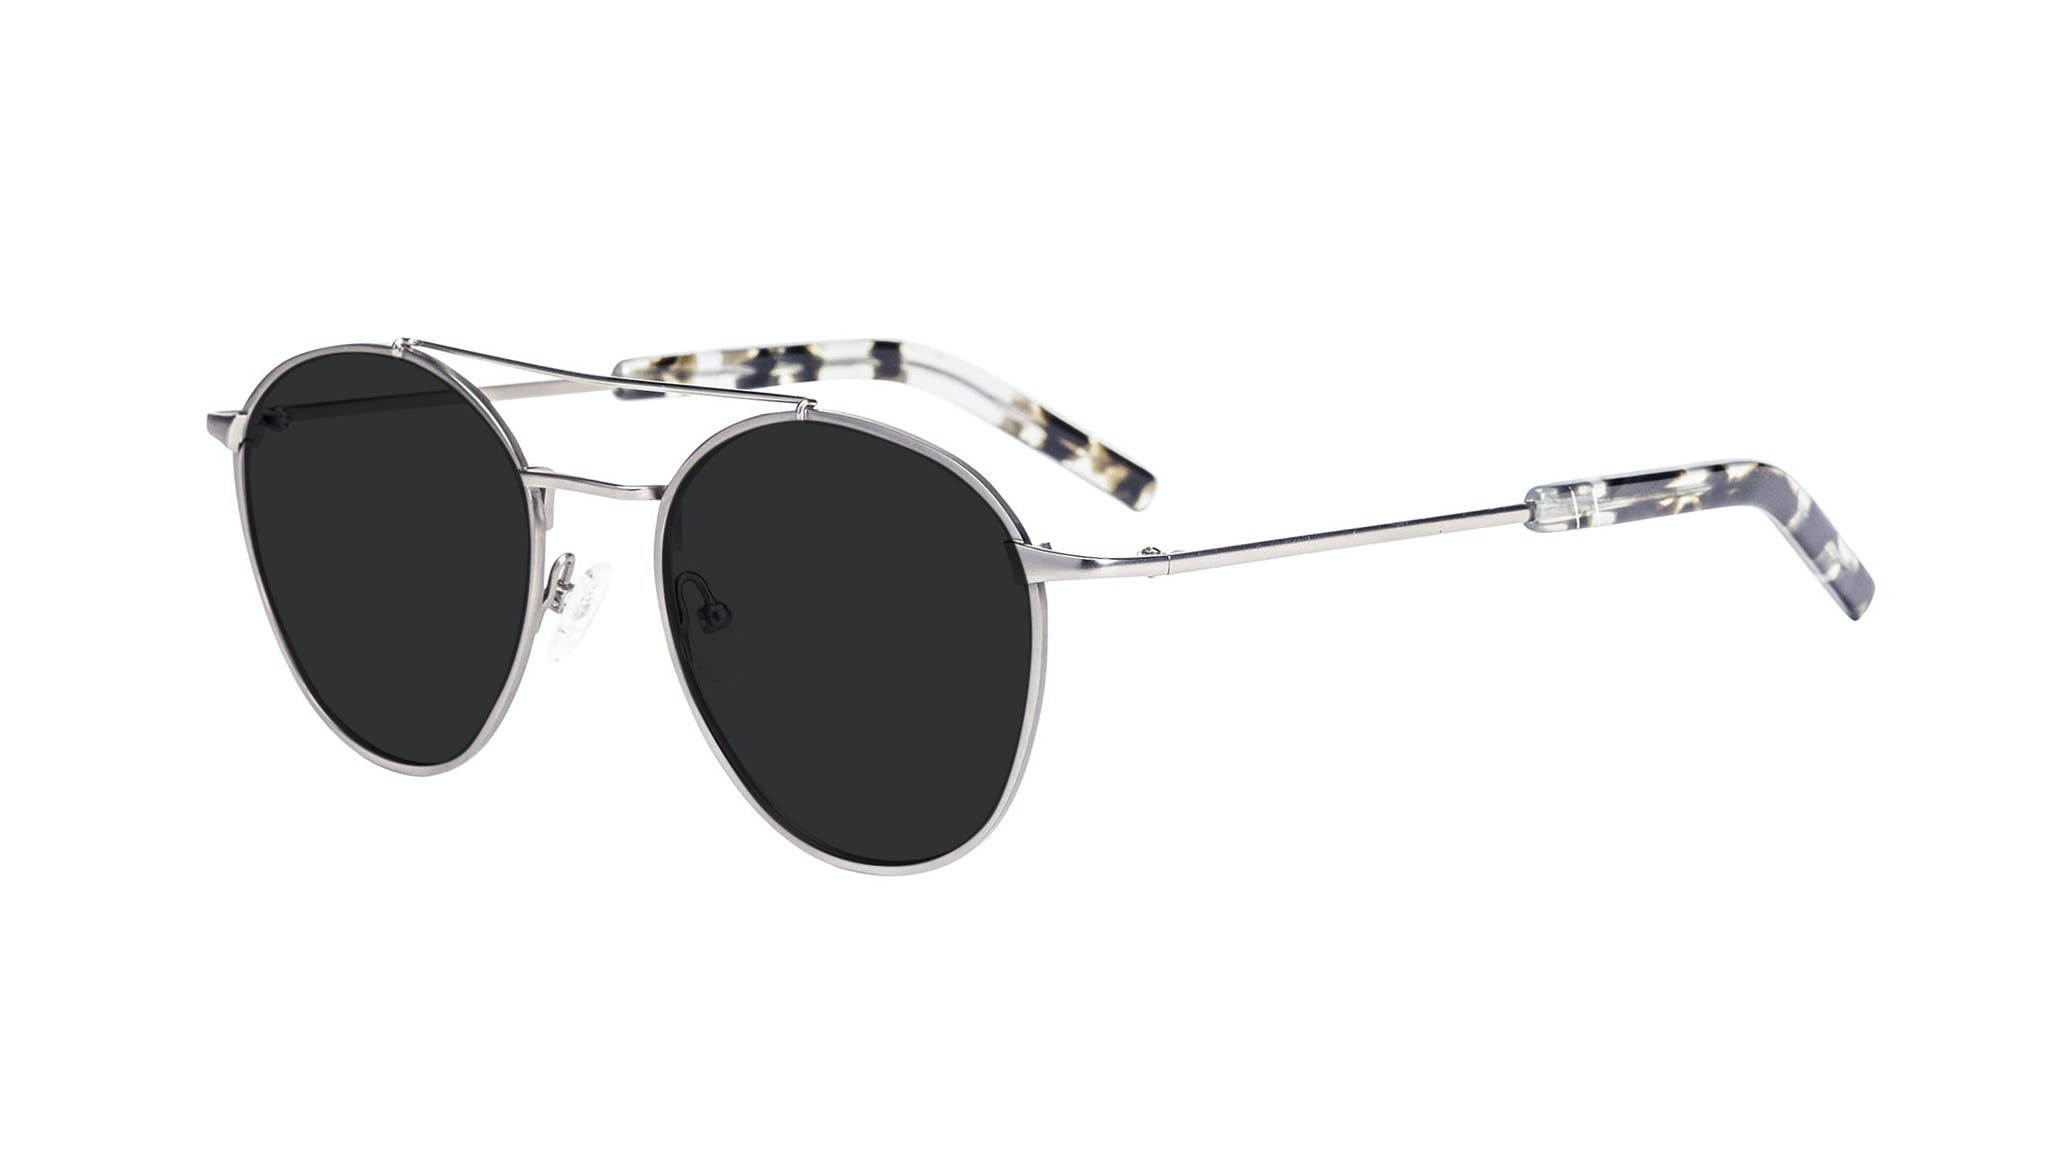 Affordable Fashion Glasses Aviator Sunglasses Men Gravity Silver Tilt